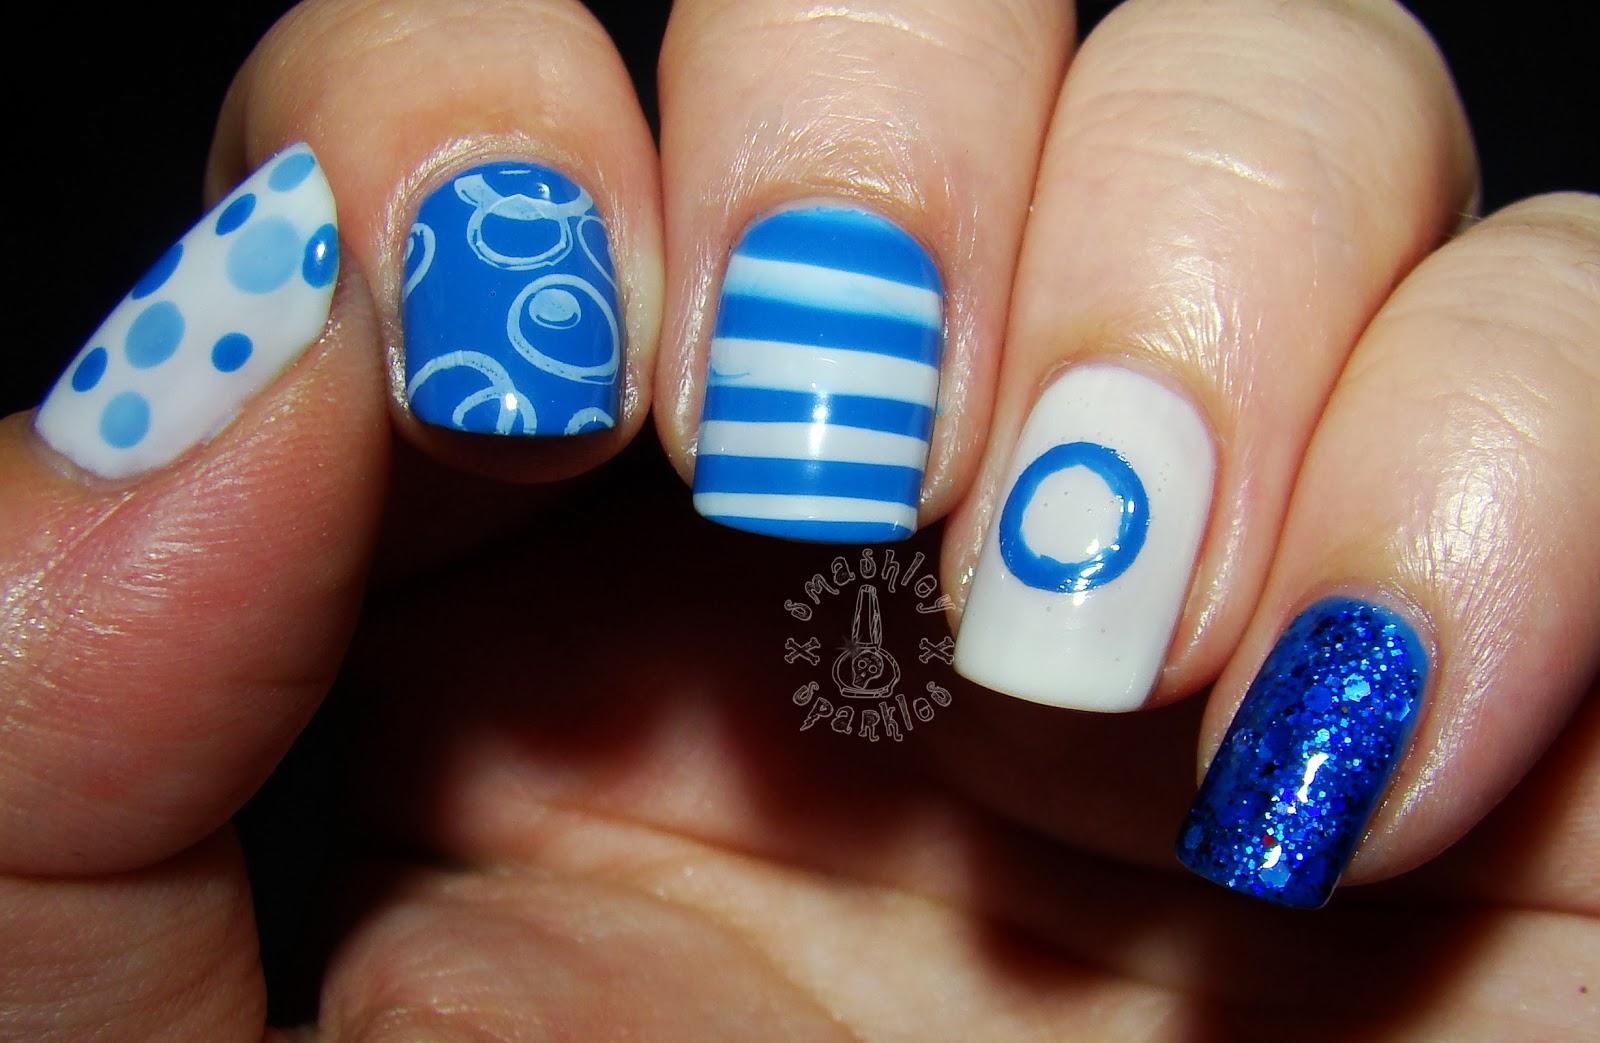 Fine Diabetes And Nails Frieze - Nail Art Ideas - morihati.com